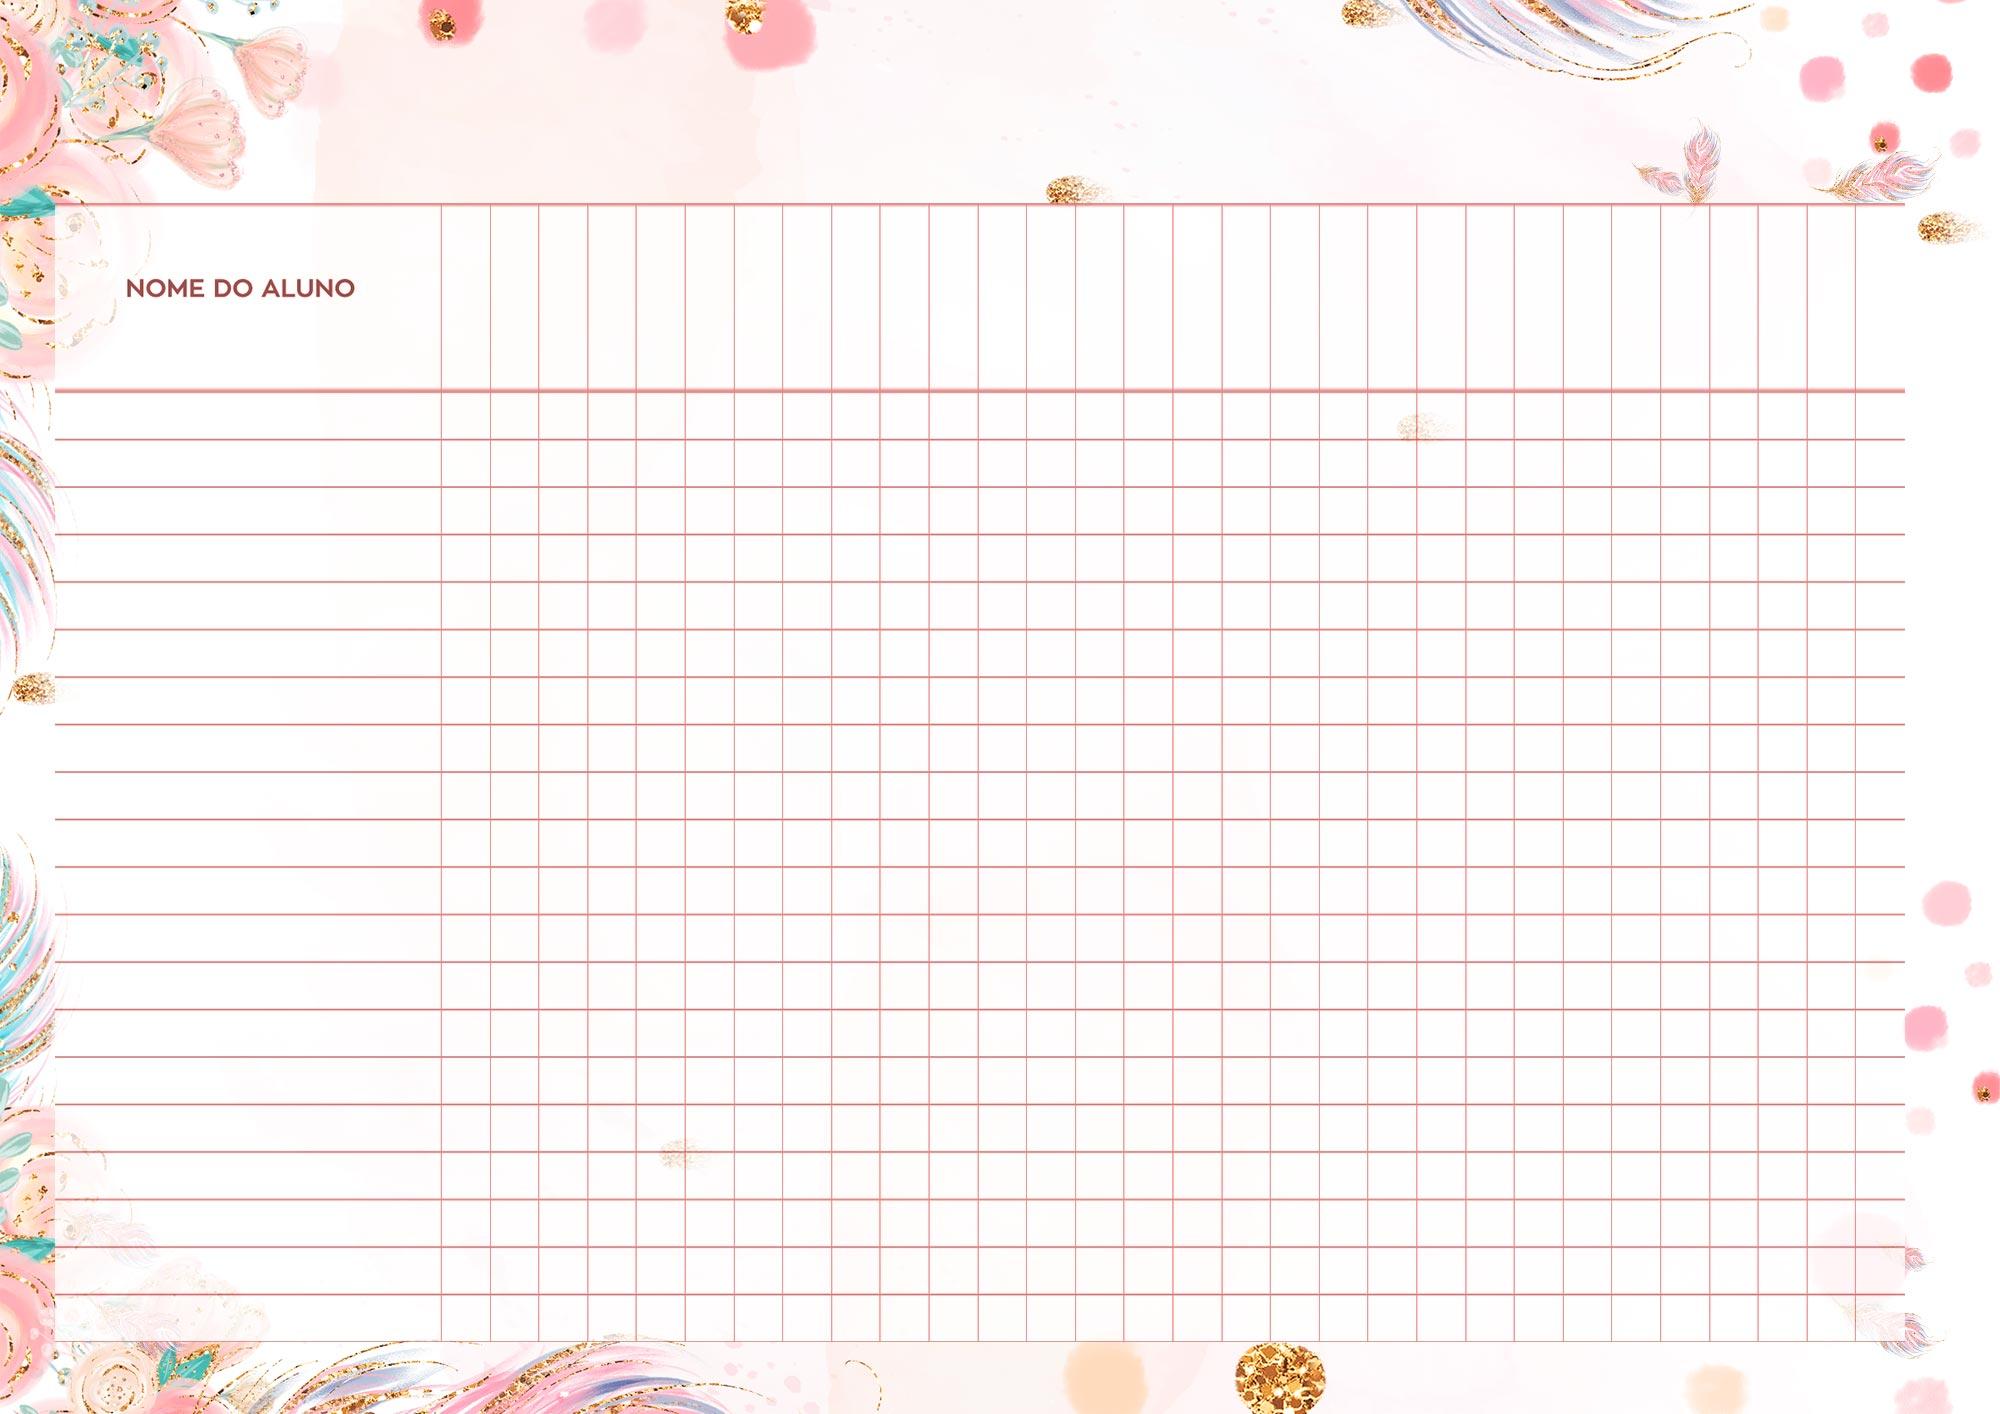 Planner Professor Raposinha Tabela em Branco